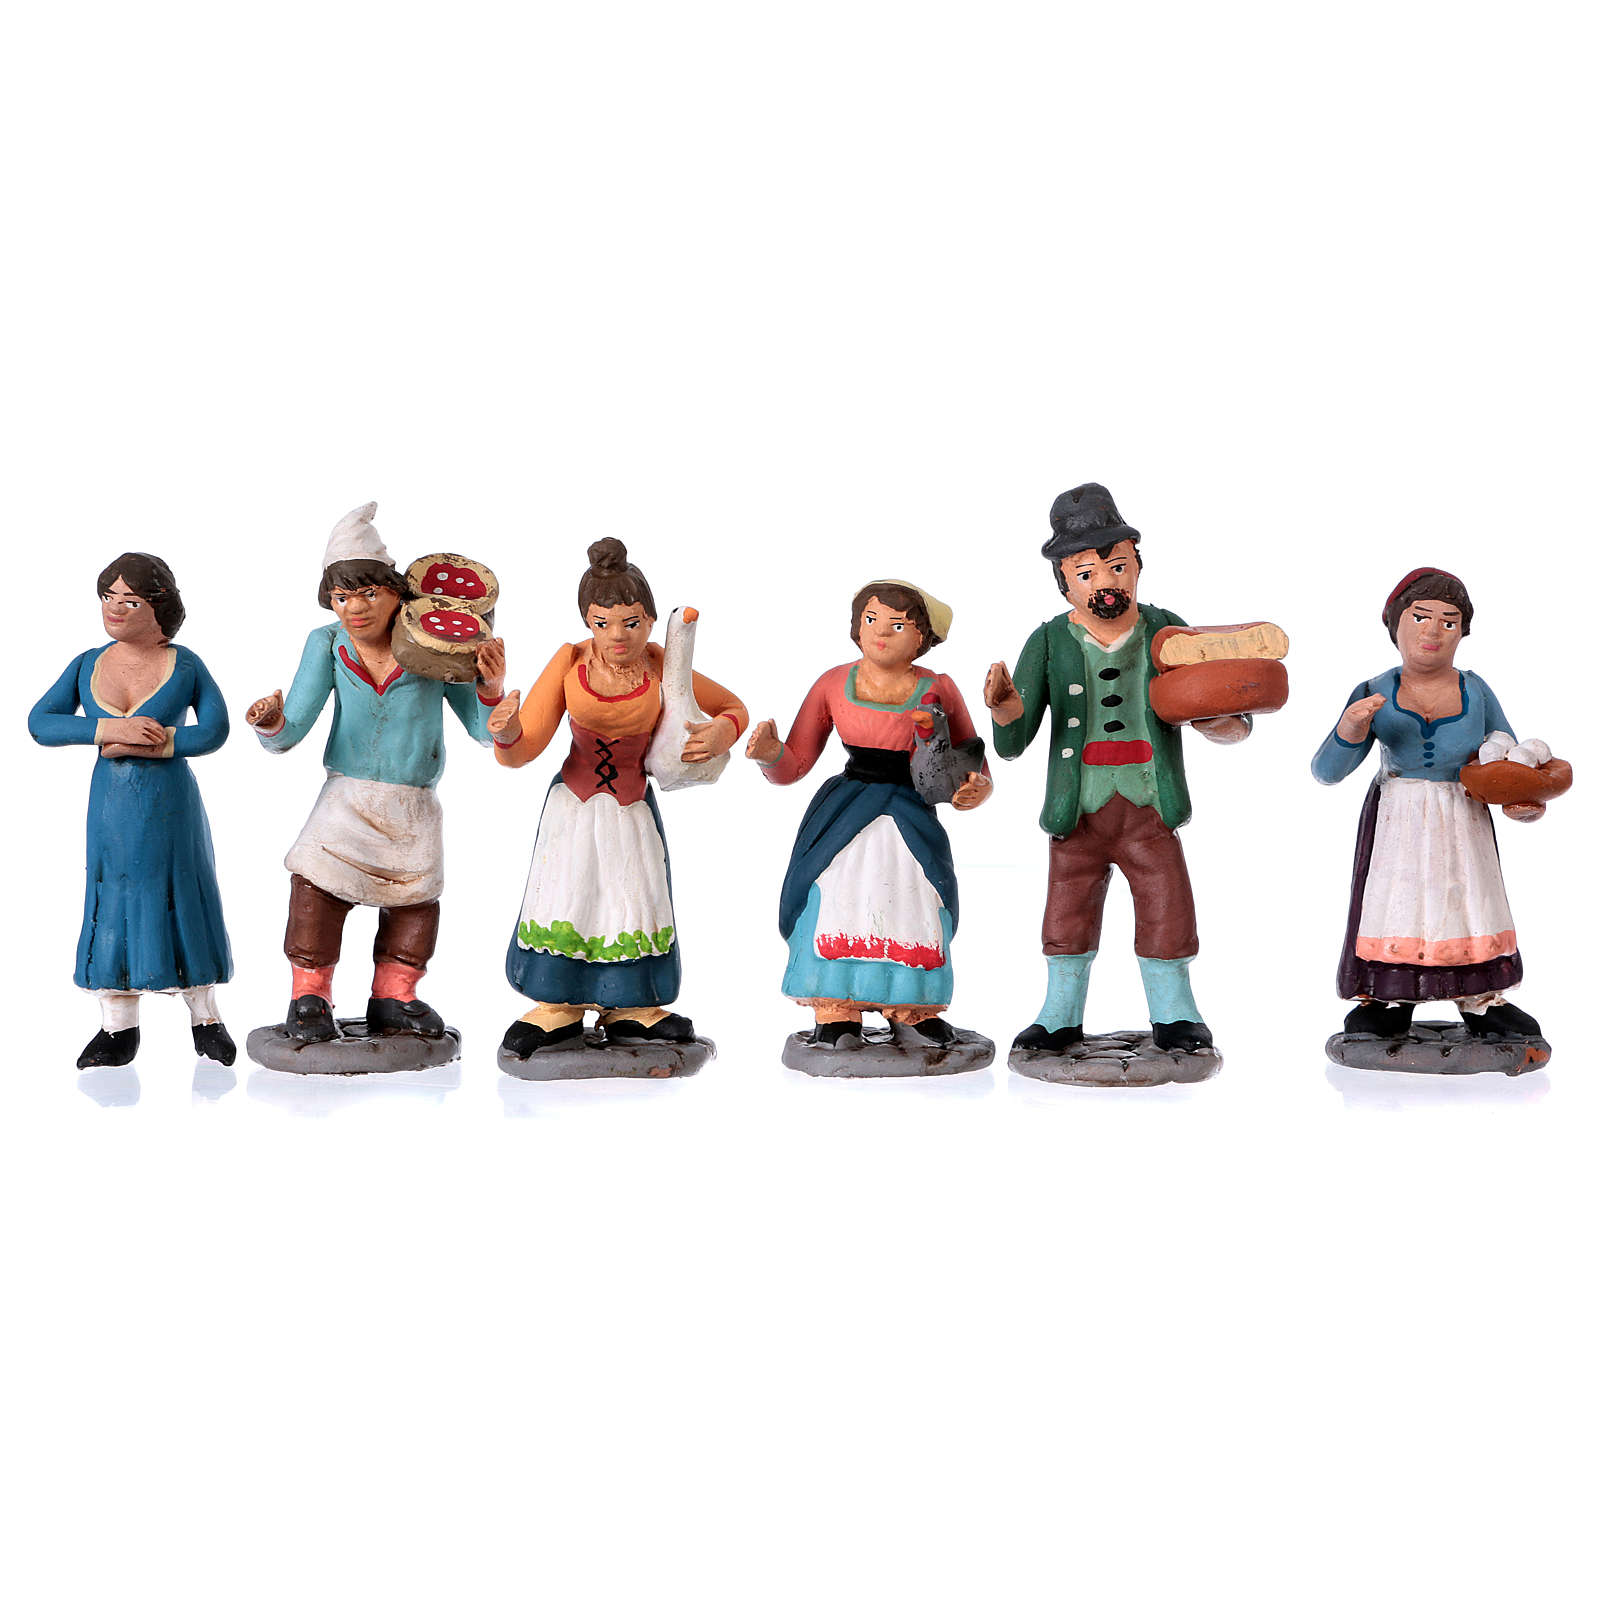 Personajes belén terracota 10 cm de altura media belén napolitano set 36 piezas 4